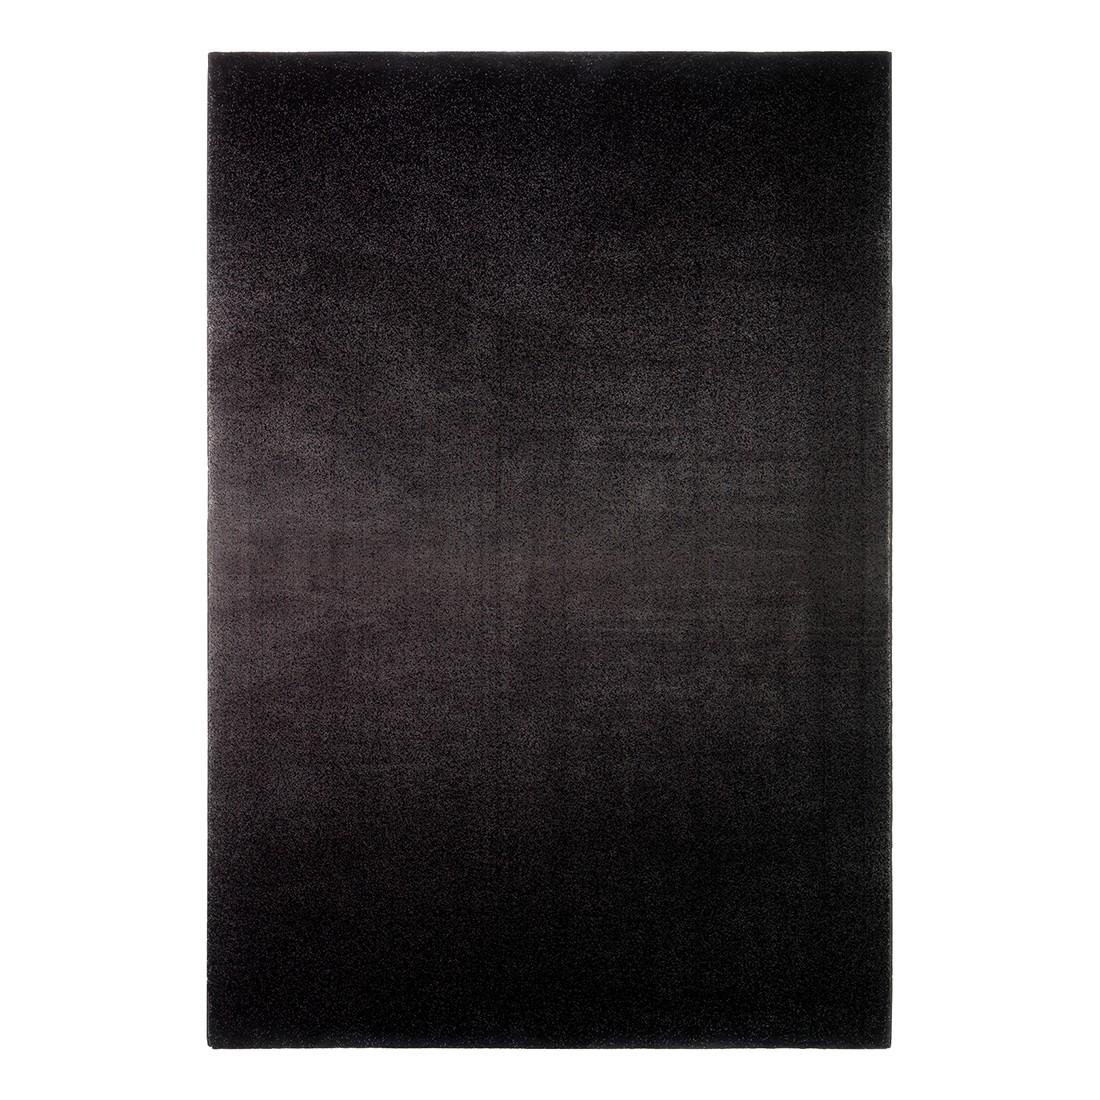 teppich richmond anthrazit 140 cm x 200 cm esprit. Black Bedroom Furniture Sets. Home Design Ideas